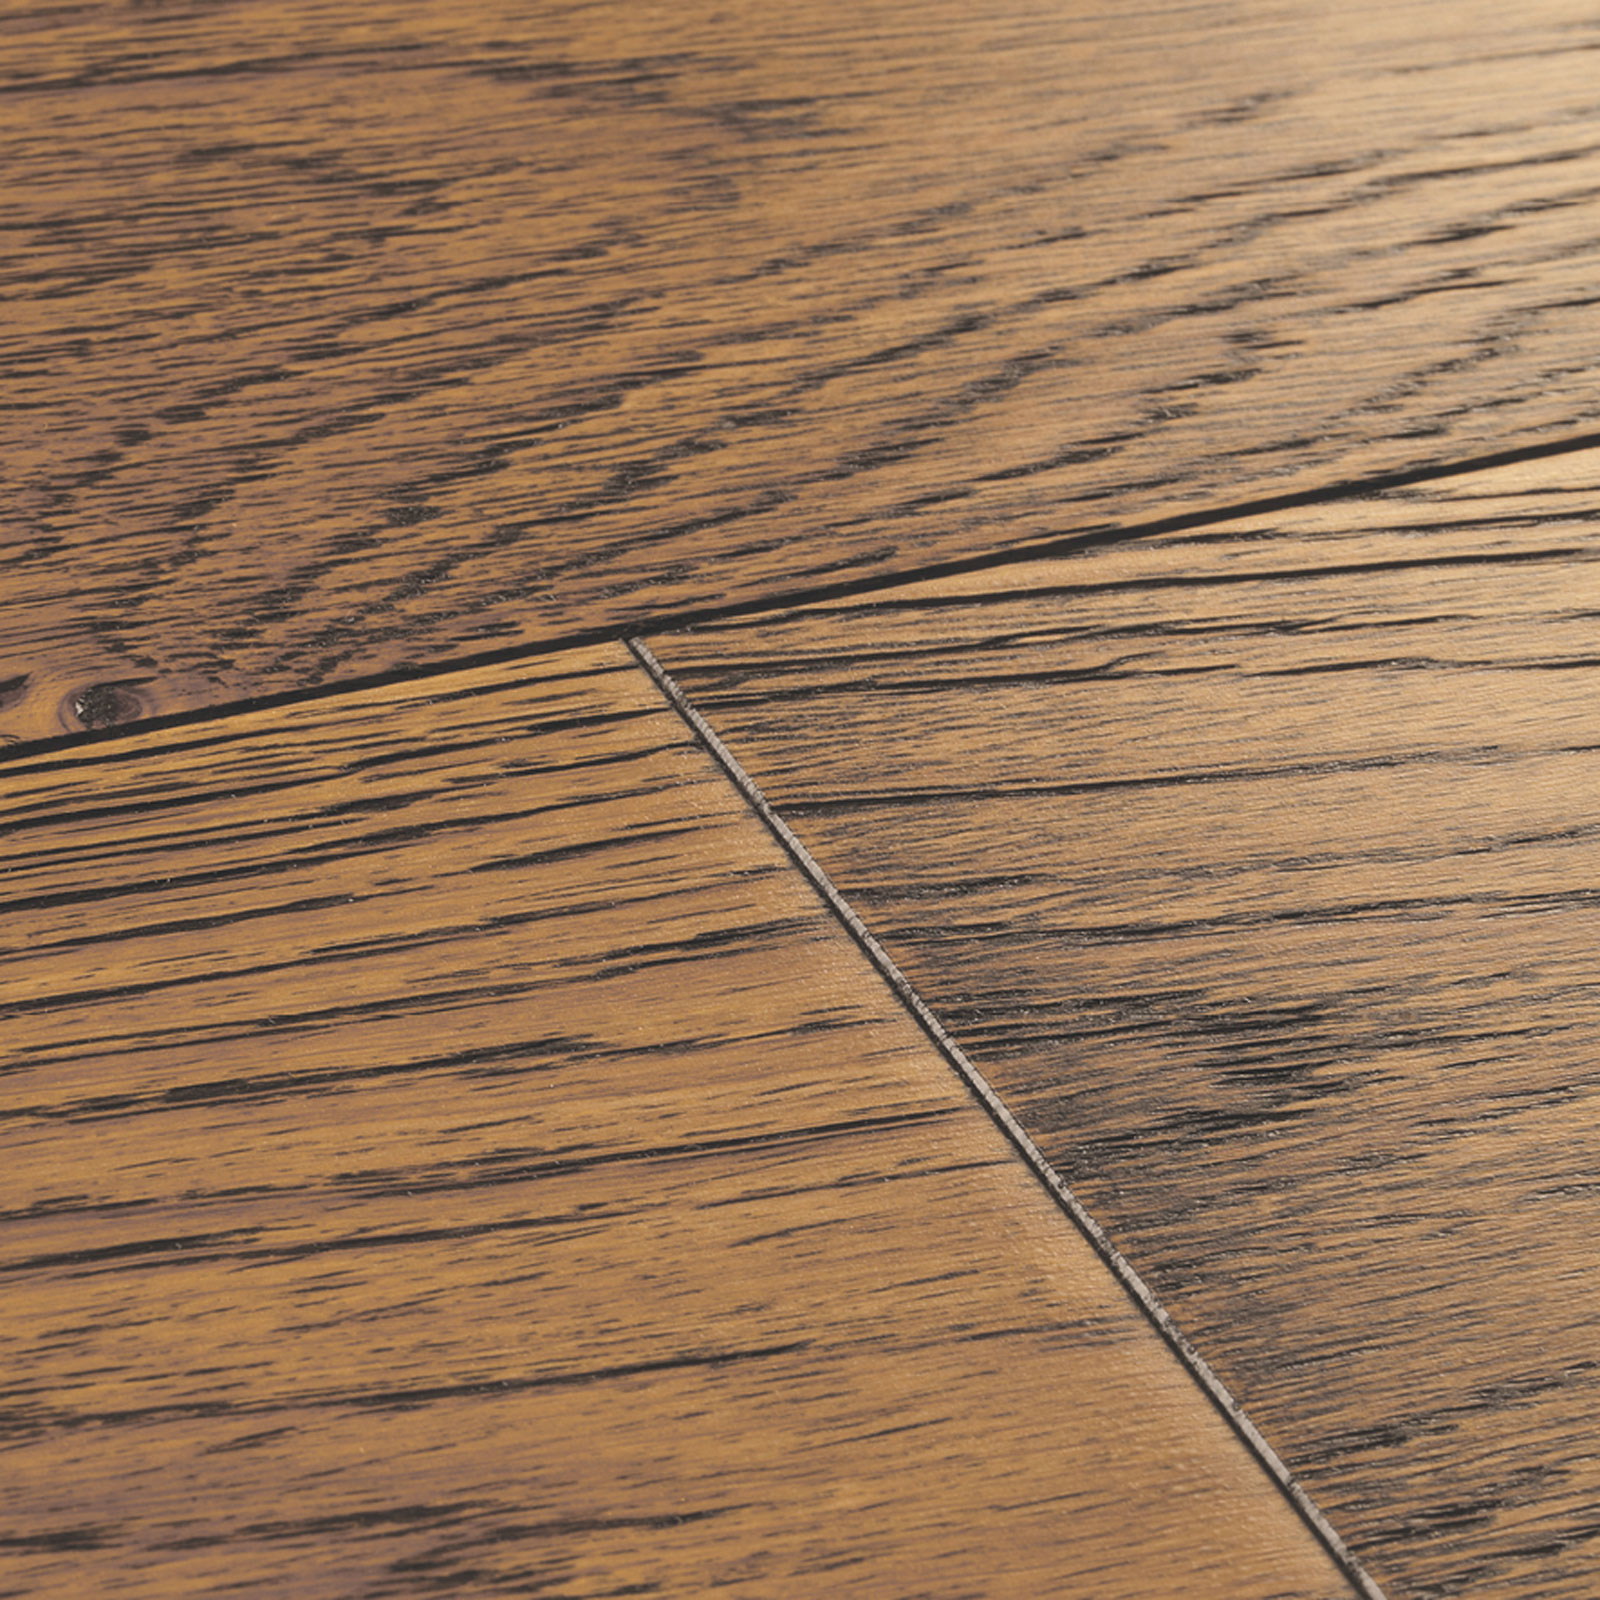 swatch-cropped-raglan-antique-oak-1600